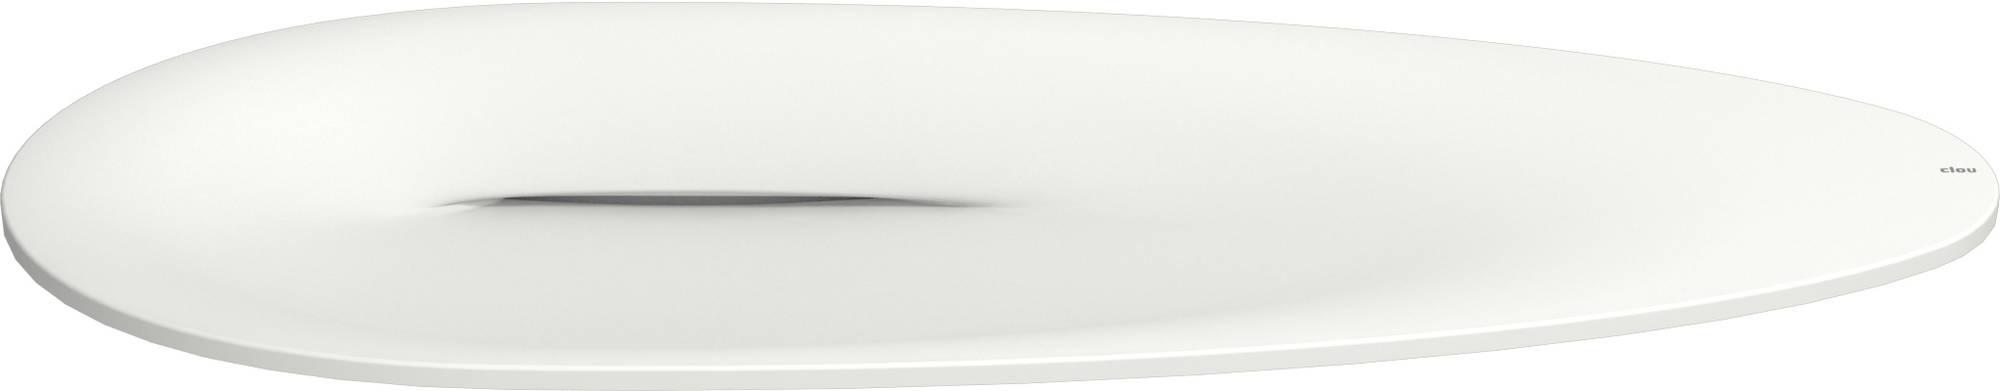 Wastafel Hangend Clou First Ovaal 84x46x11cm Cristalplant Wit 3 Kraangaten